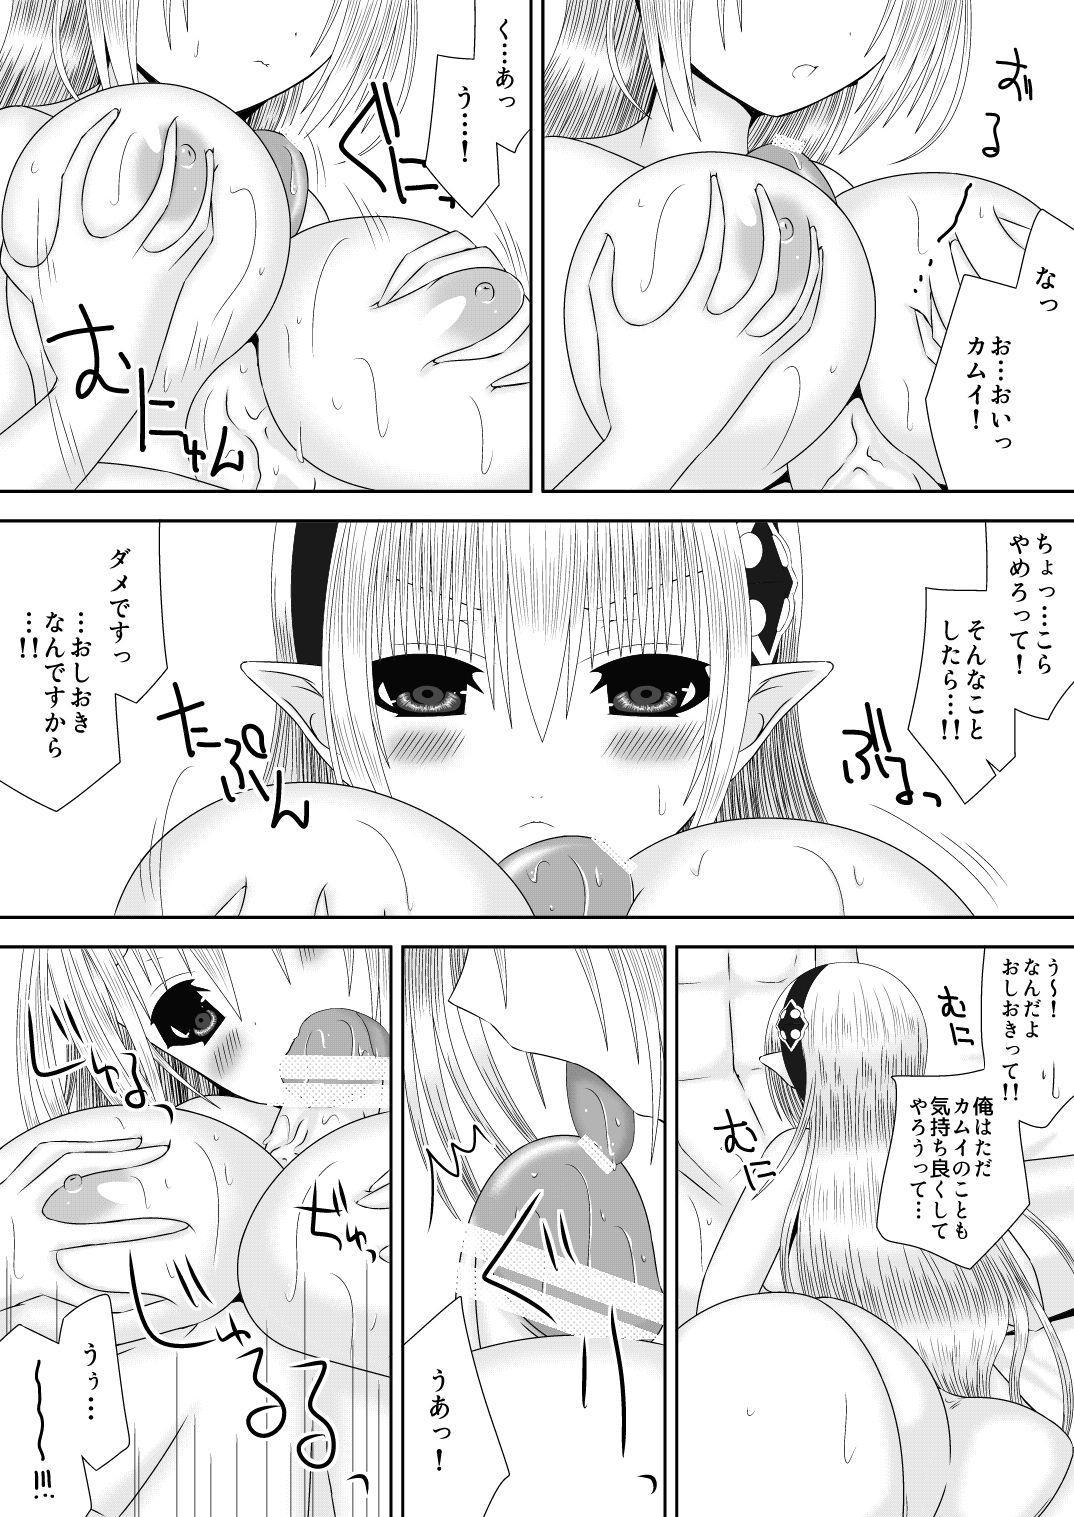 [Oda Natsuki] Ookami-san to Ohime-sama (Fire Emblem if) 7